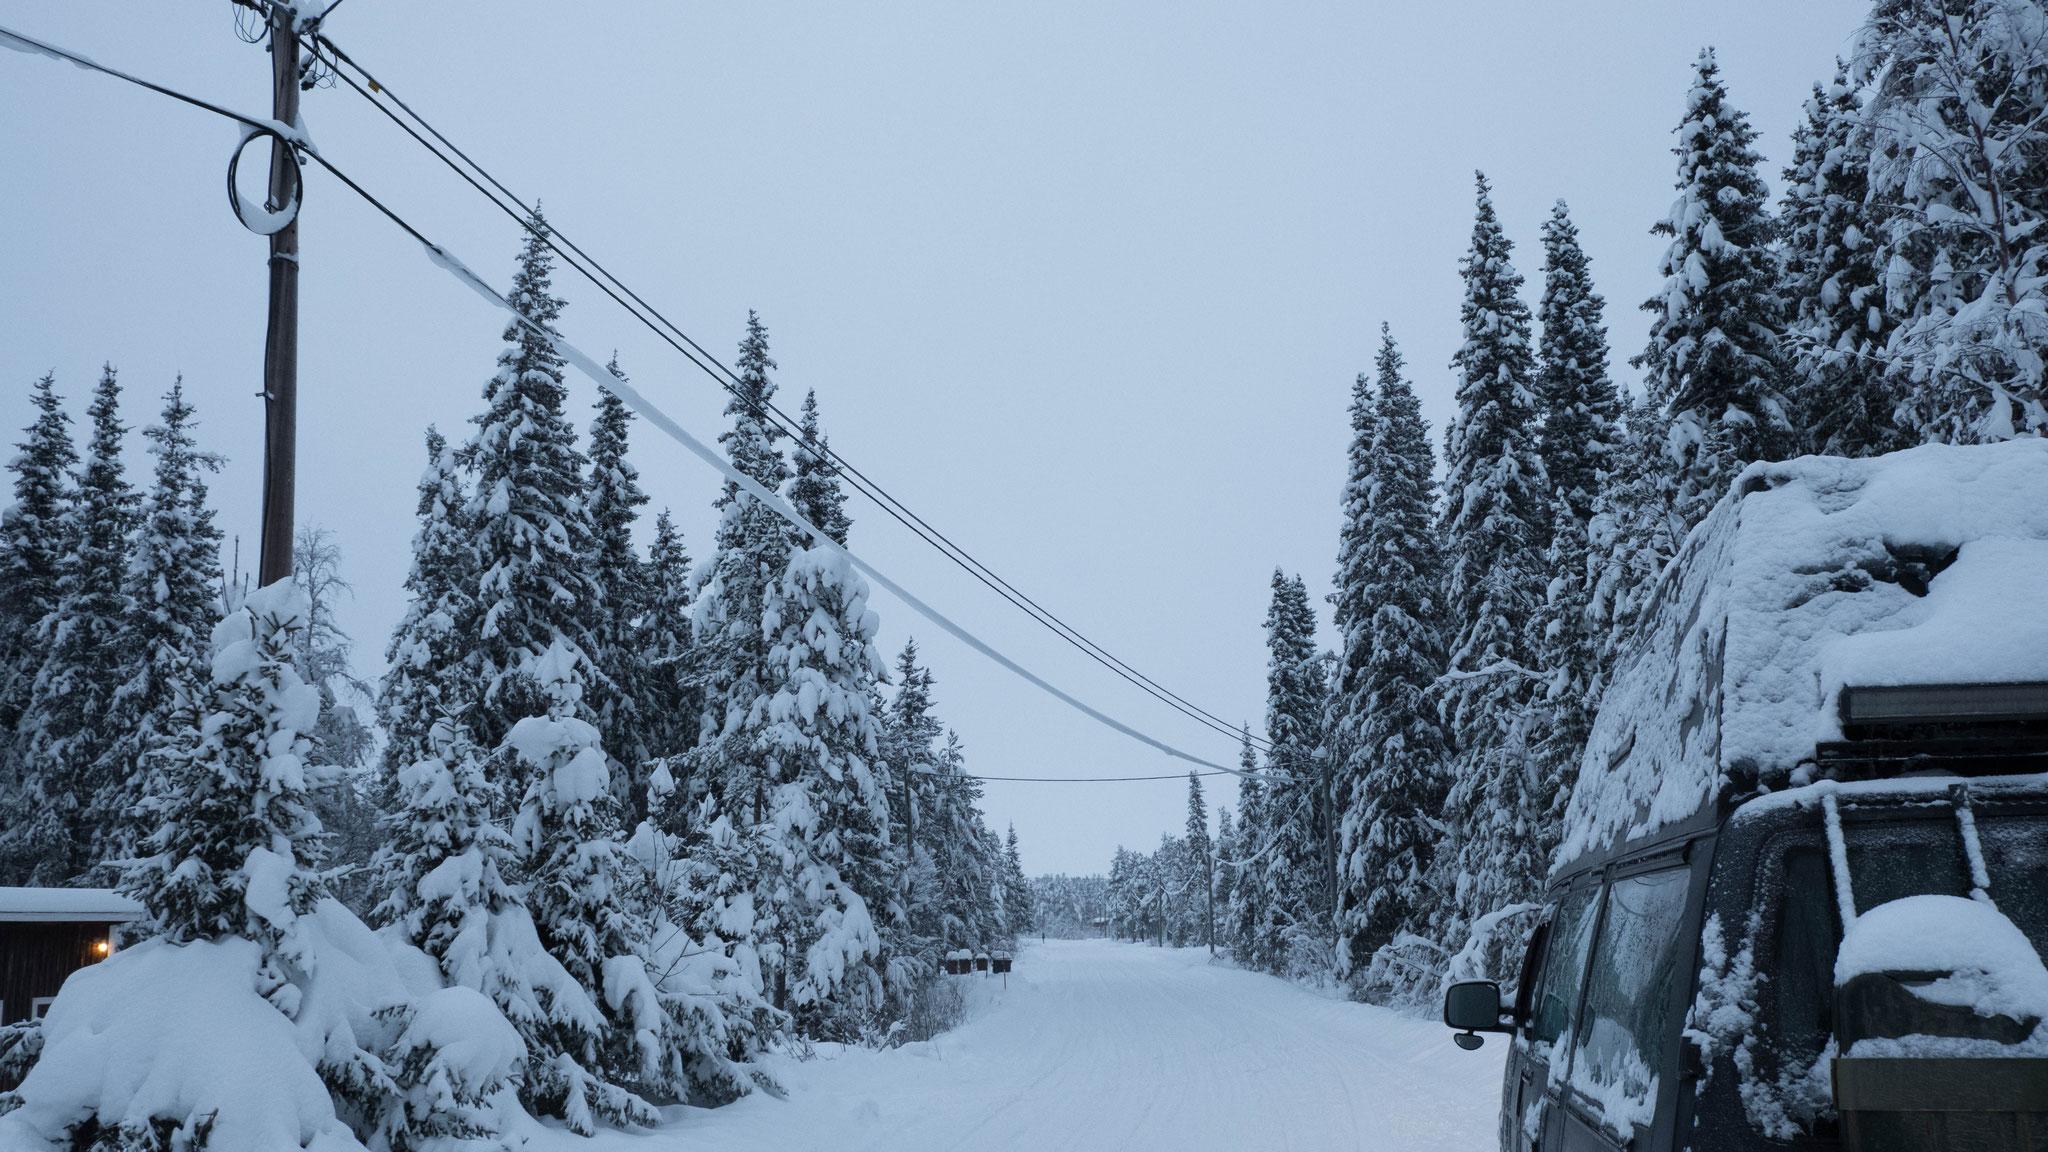 31.12.2020 gegen 12 Uhr bewölt auf dem Weg nach Kiruna